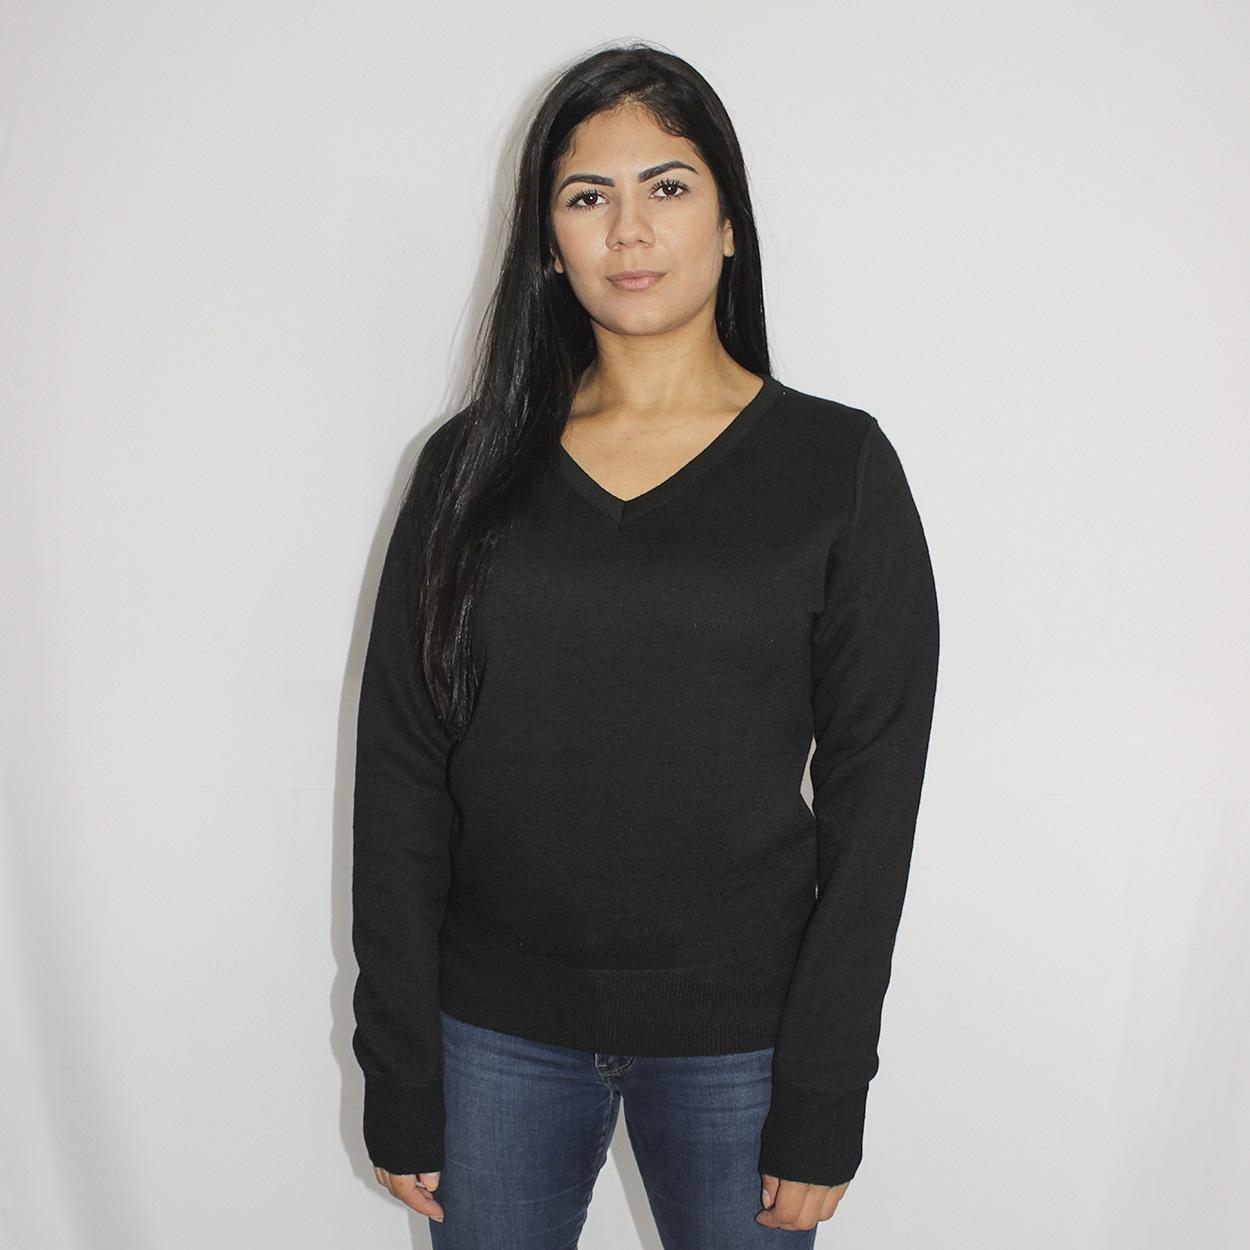 Suéter Feminino em Tricot